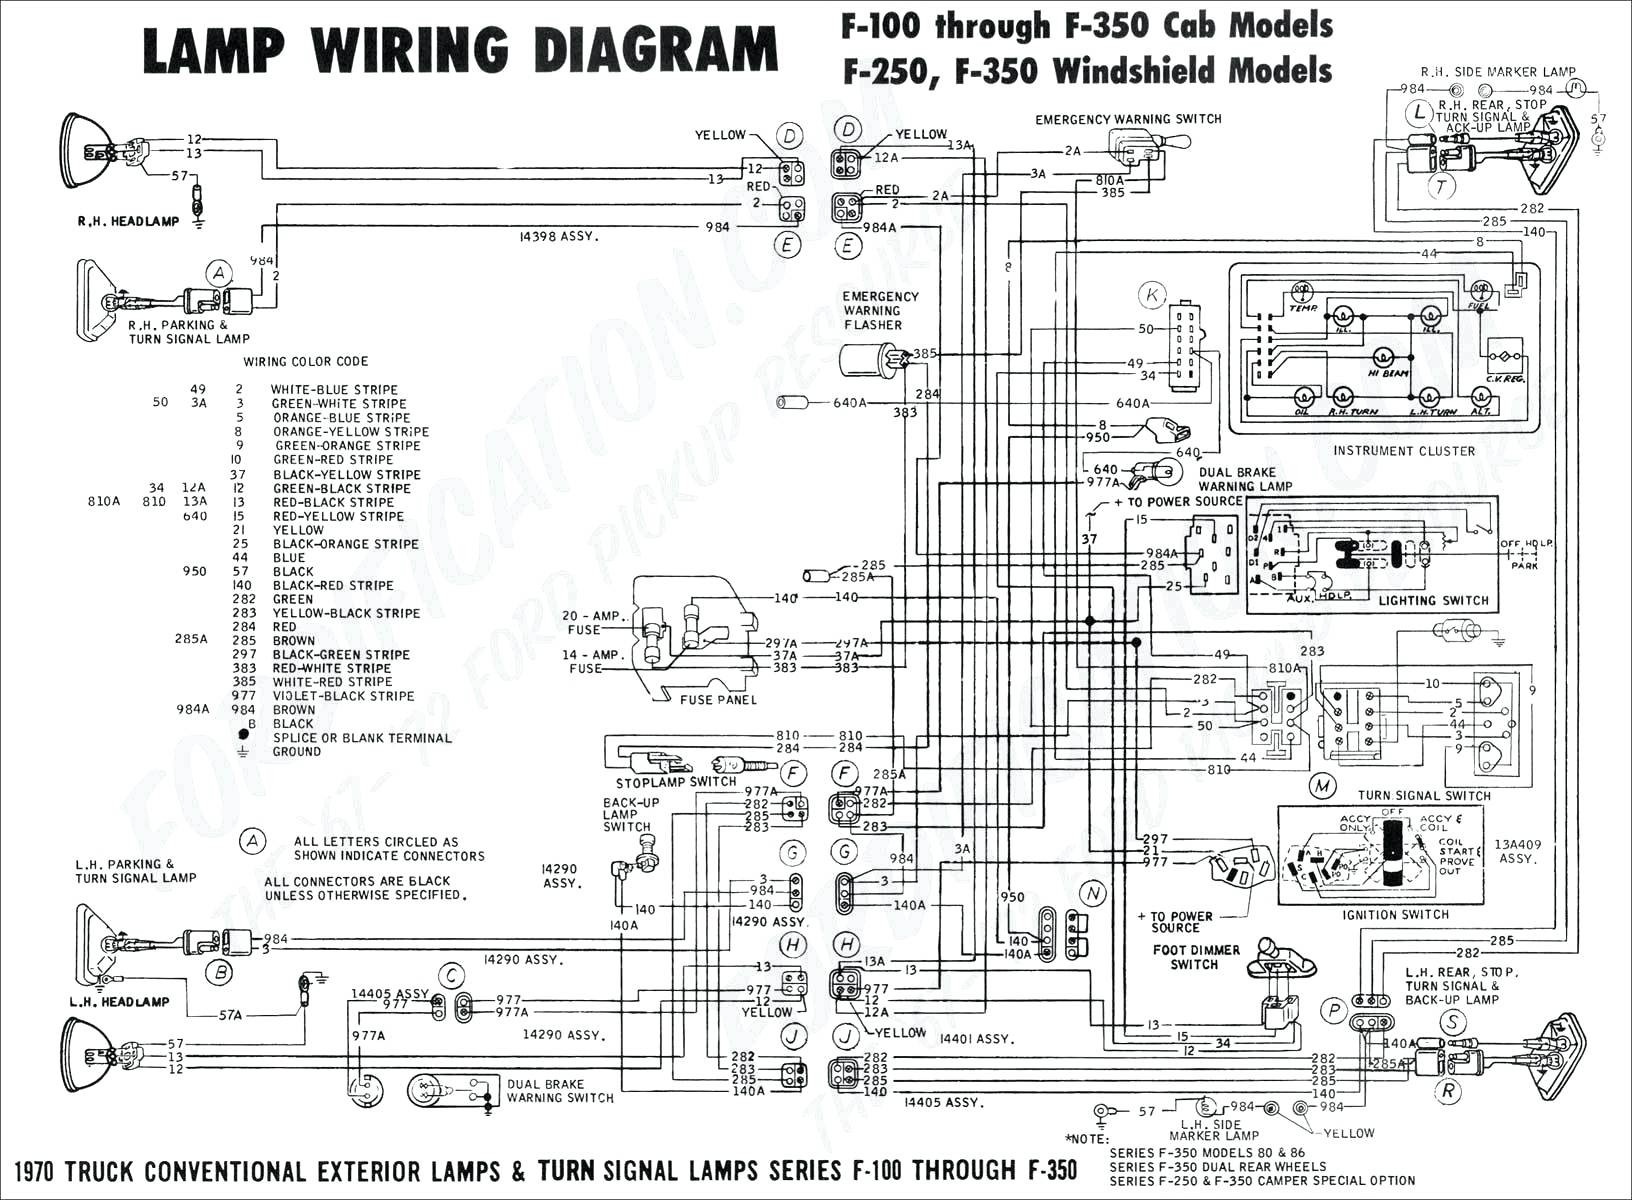 7 Wire Trailer Plug Diagram 450 Fuse Box Diagram Moreover 7 Wire Trailer Wiring Diagram as Of 7 Wire Trailer Plug Diagram